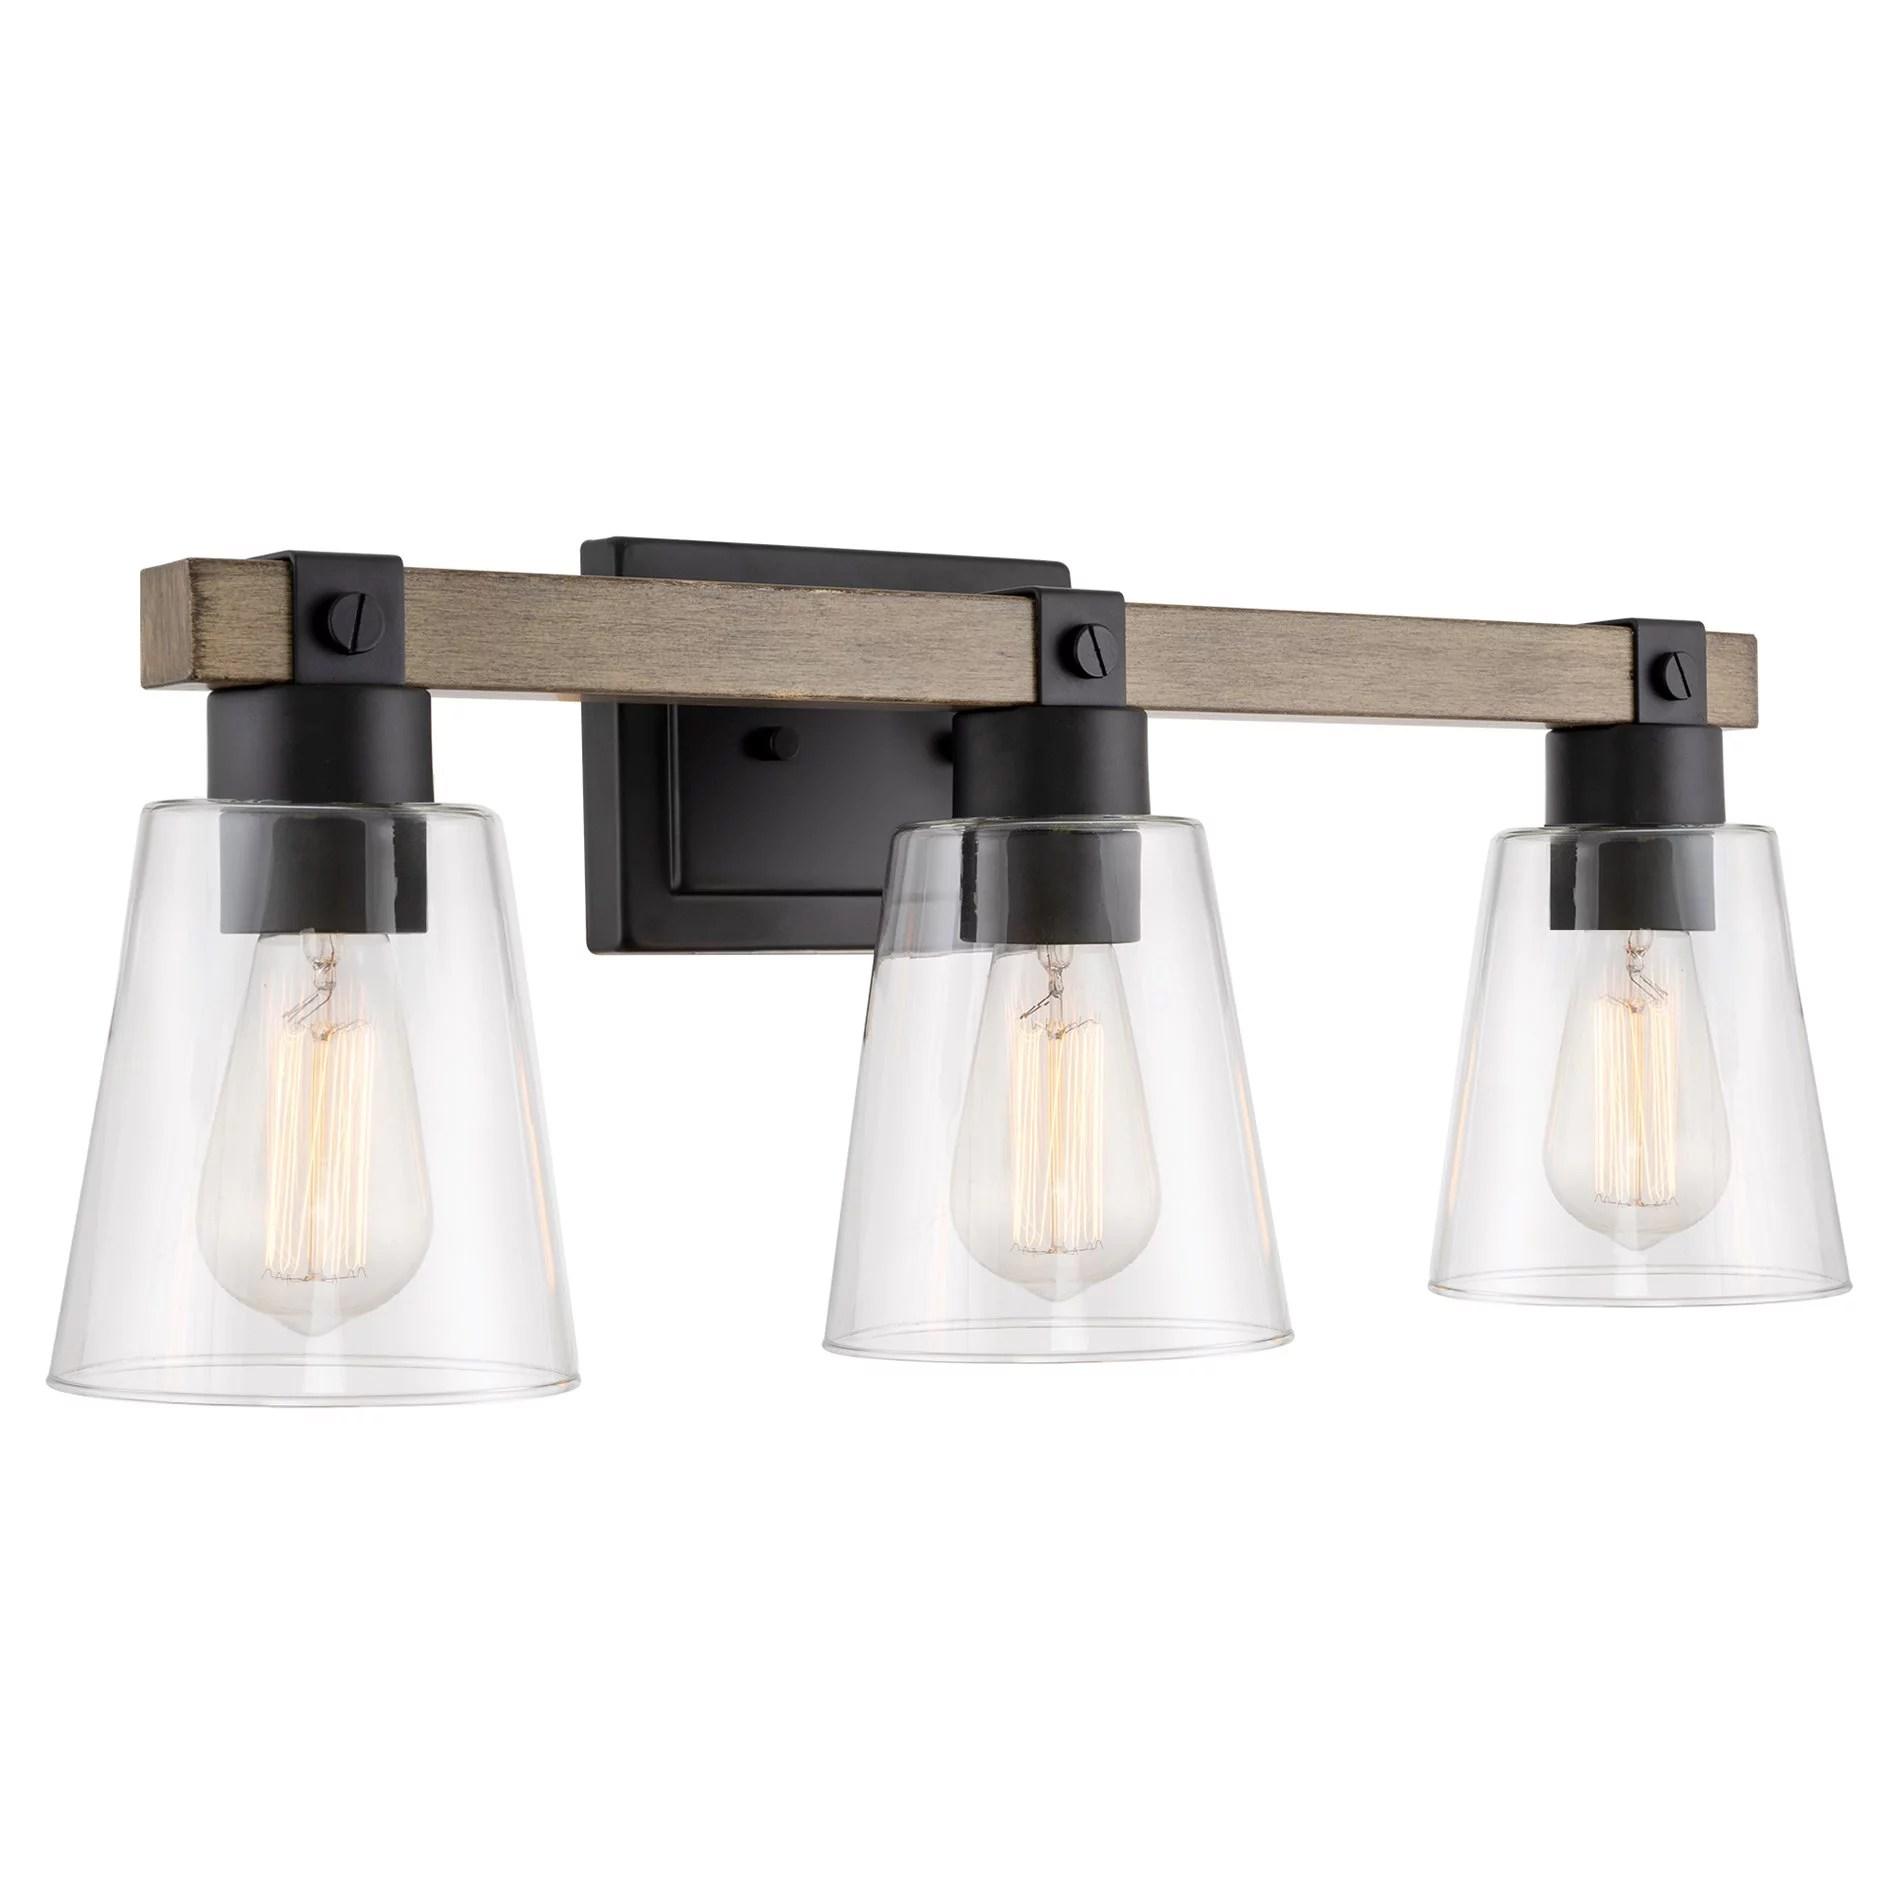 kira home asher 23 3 light farmhouse vanity bathroom light funnel glass shades smoked birch wood style black